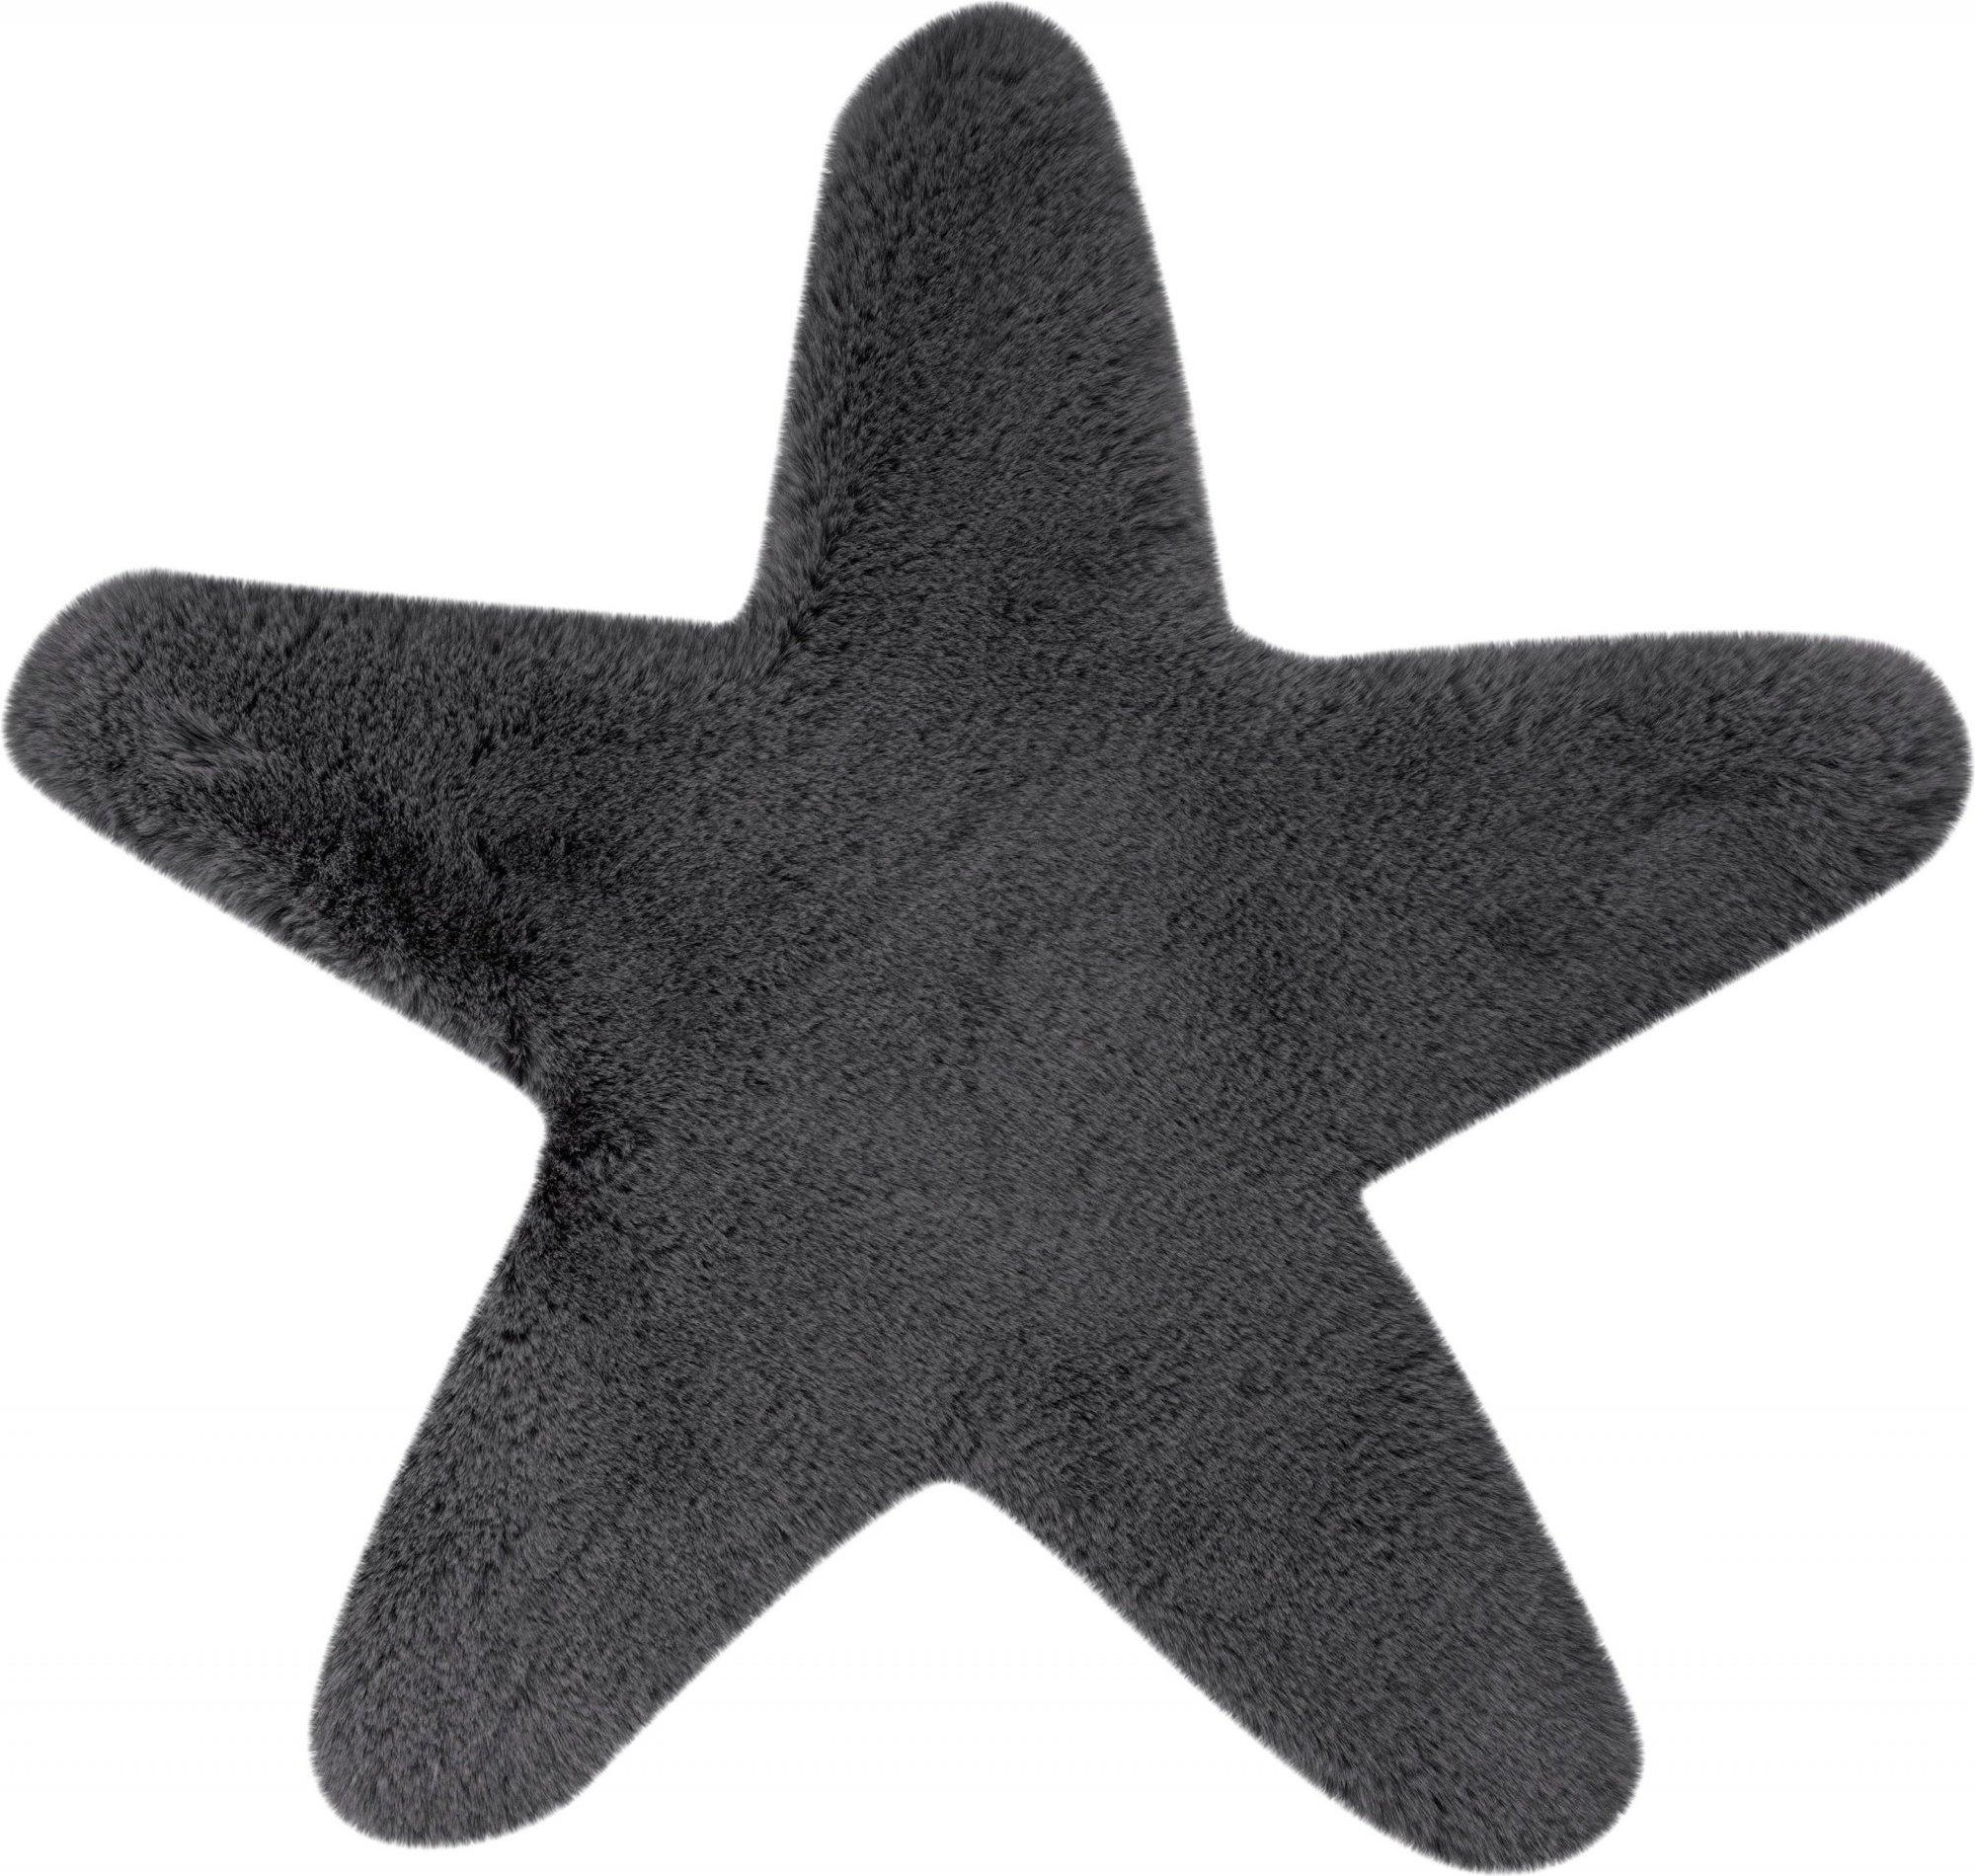 Tapis enfant gris rectangle micropolyester 60x63